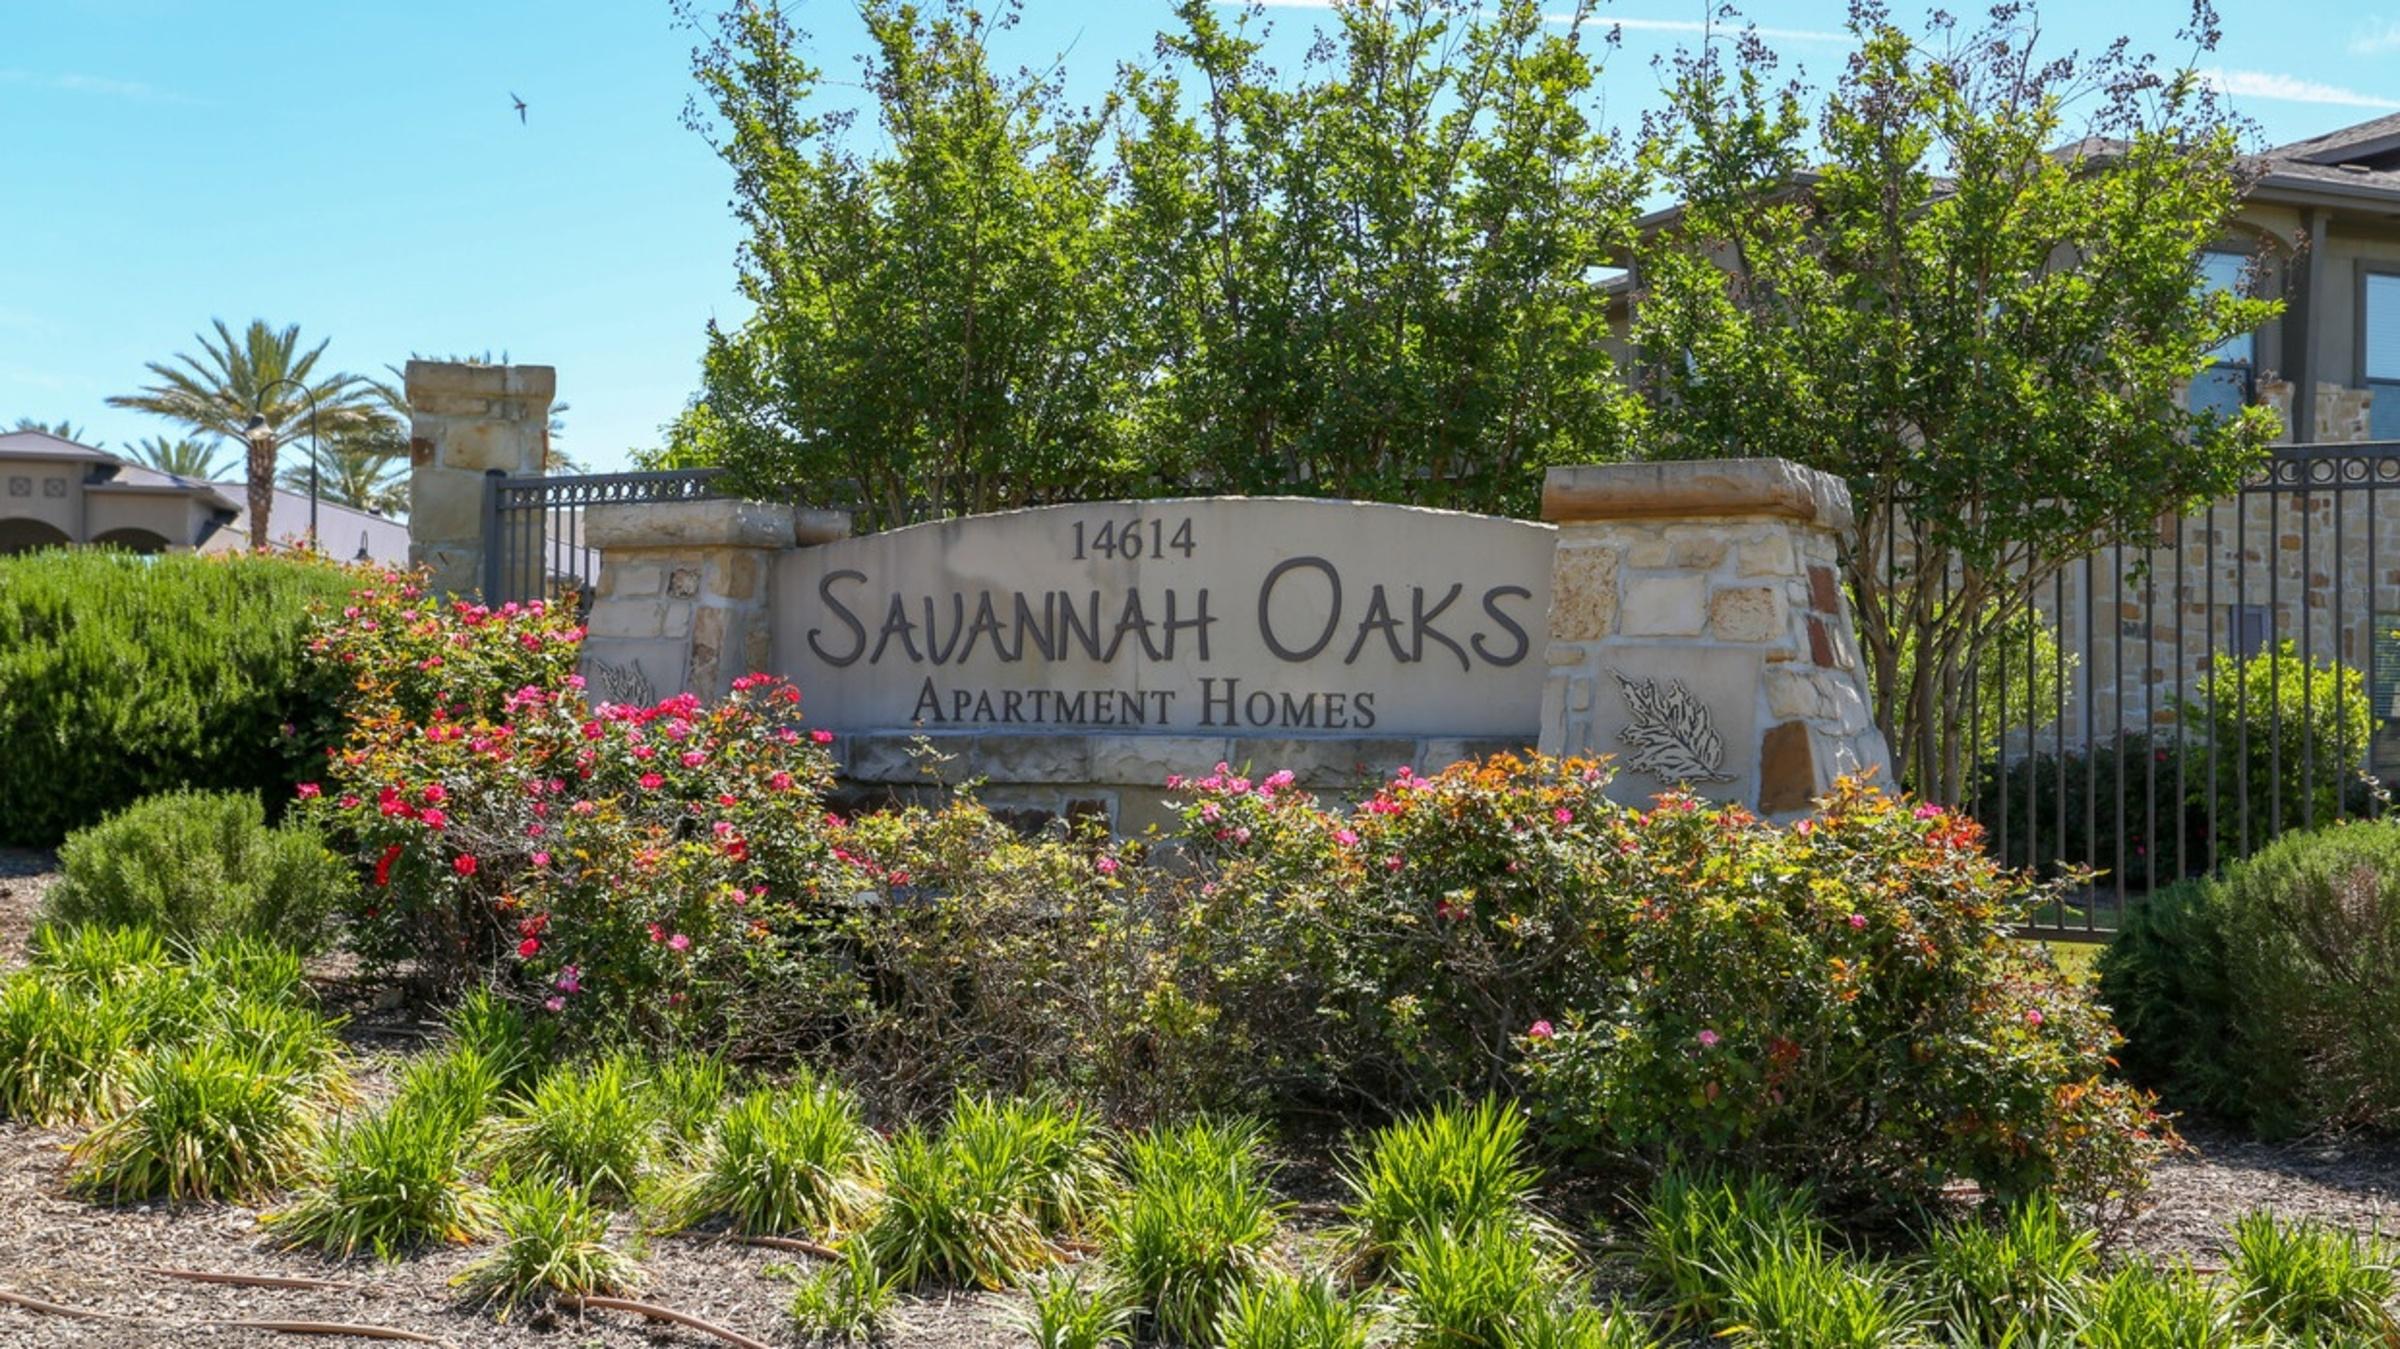 Savannah Oaks 04474